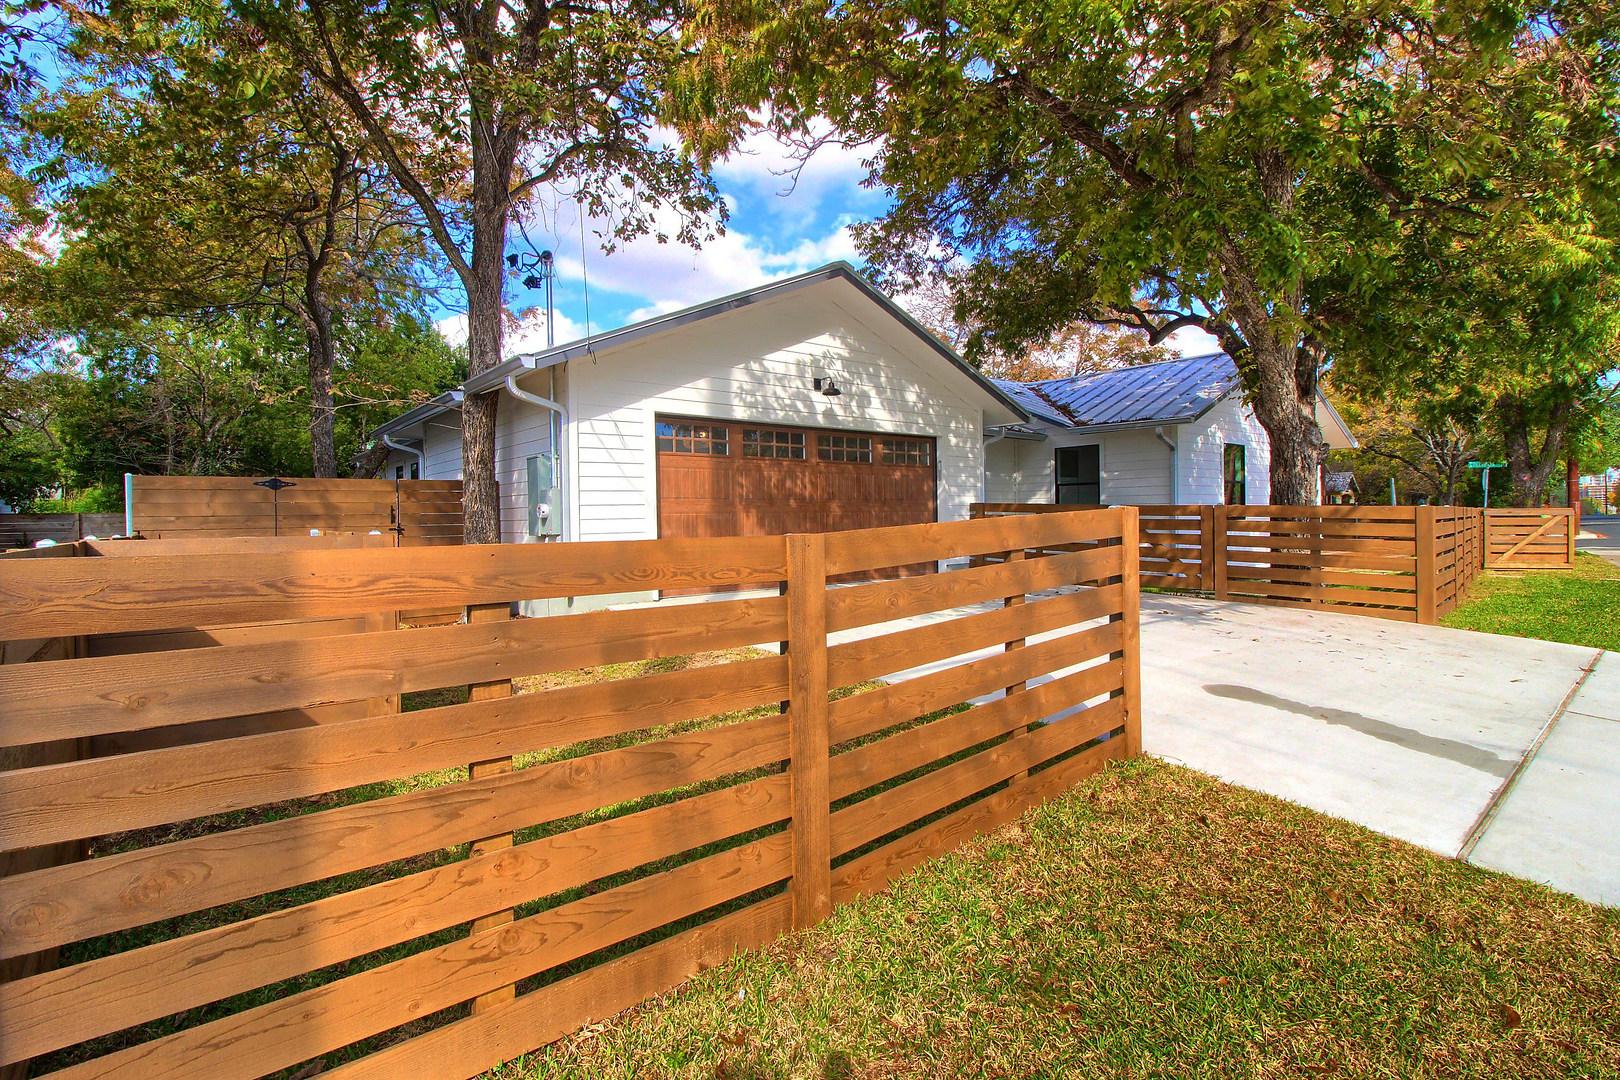 Home Renovation Front Gate on Bouldin in Austin, TX